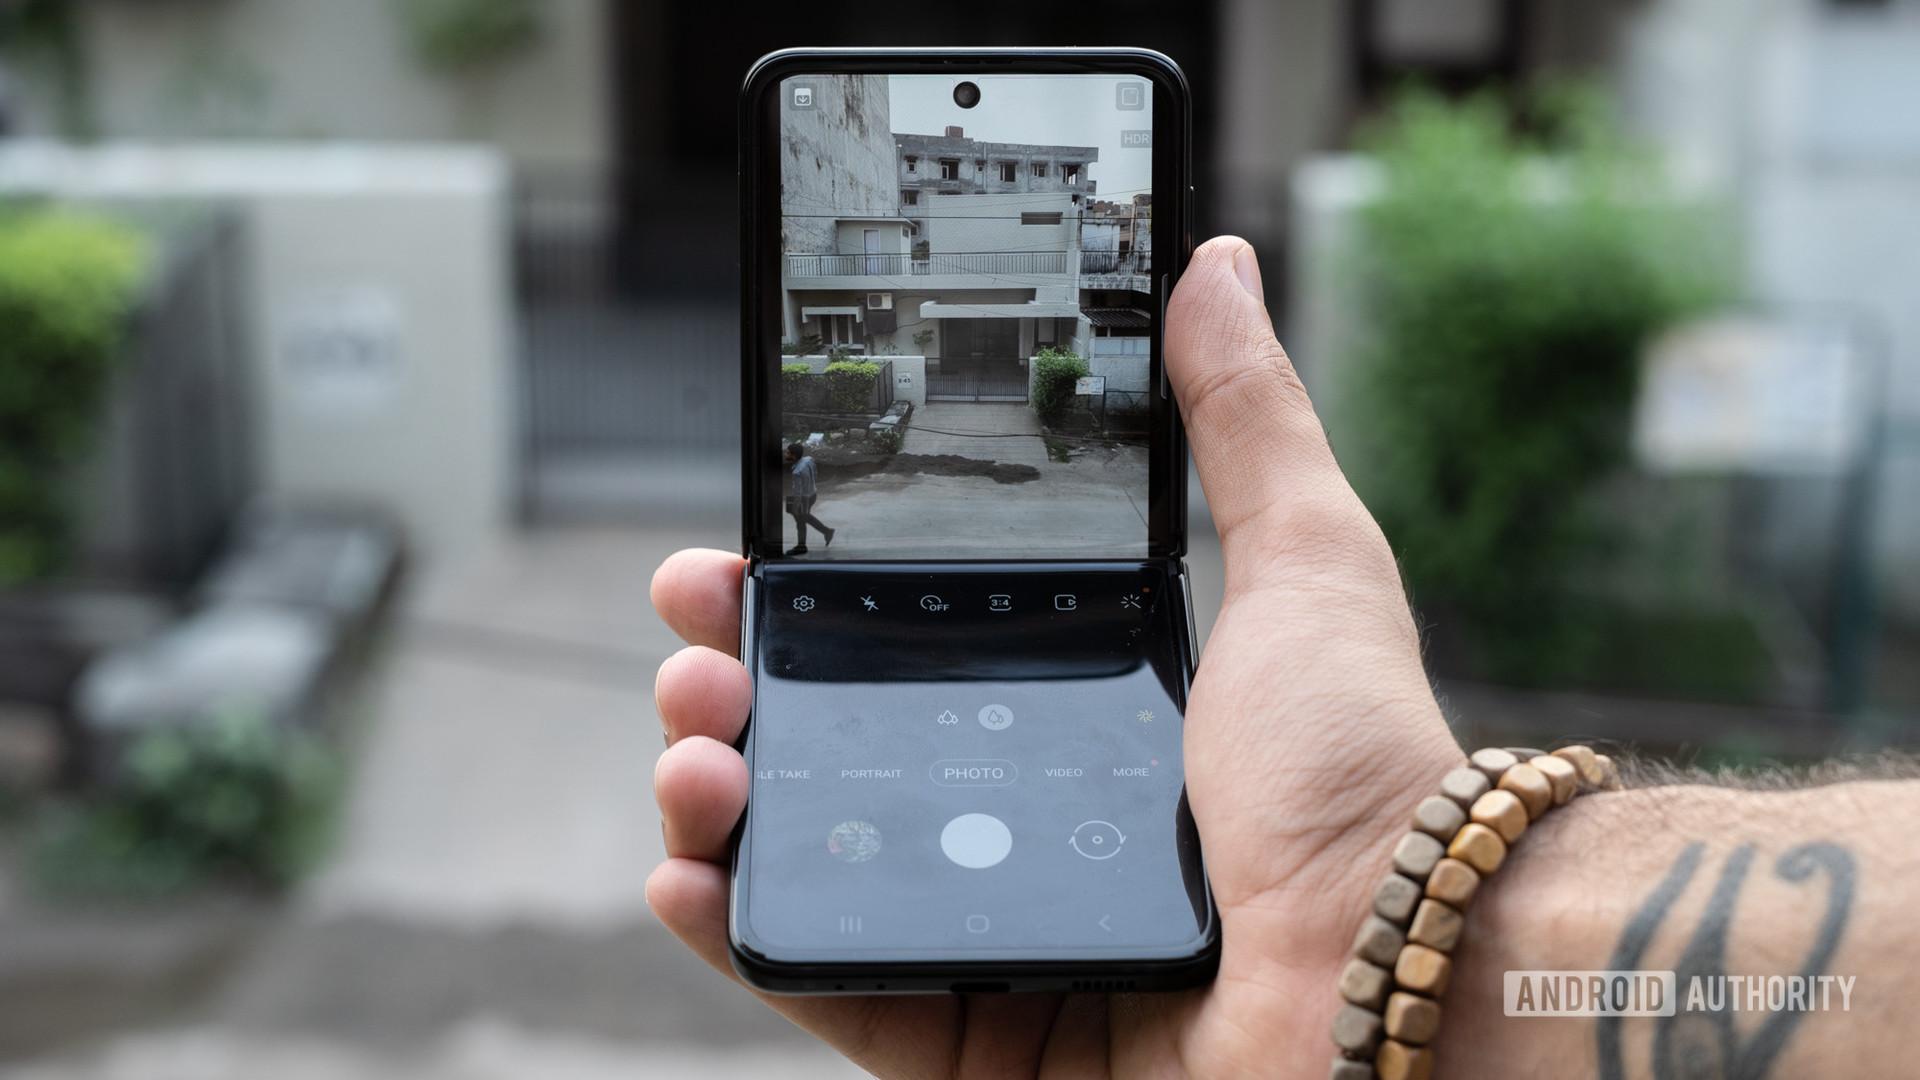 Samsung Galaxy Z Flip 3 halfway open showing camera on